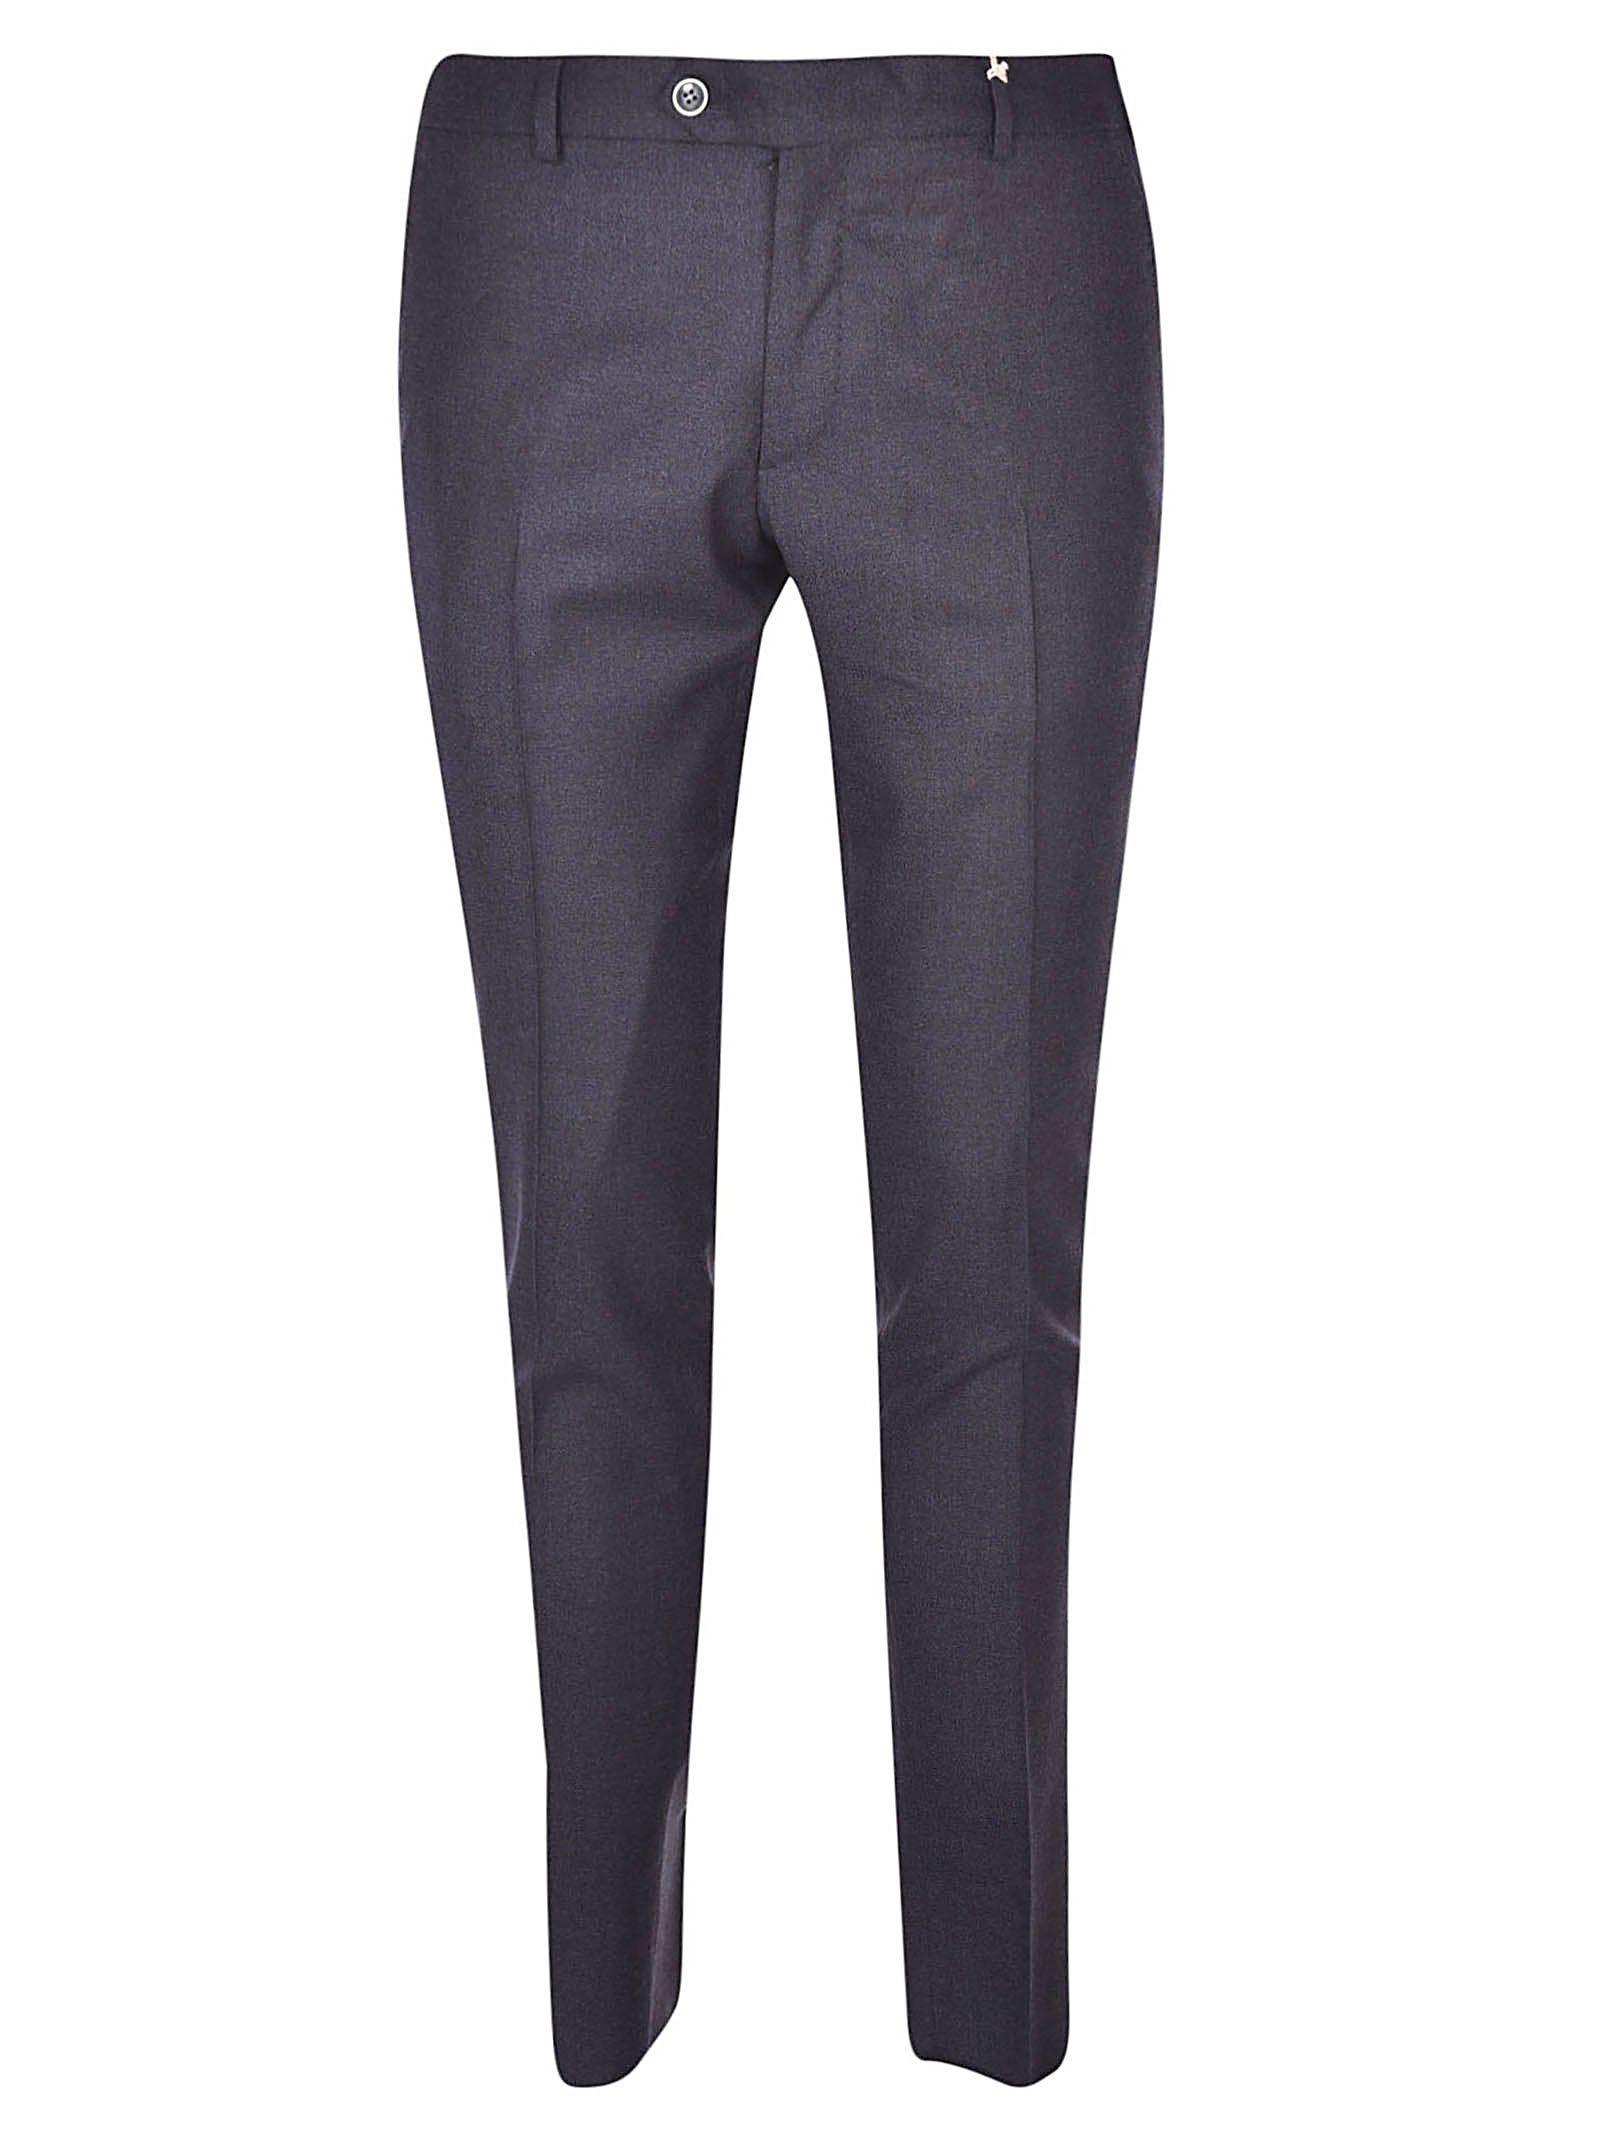 LUIGI BIANCHI MANTOVA Tailored Trousers in U